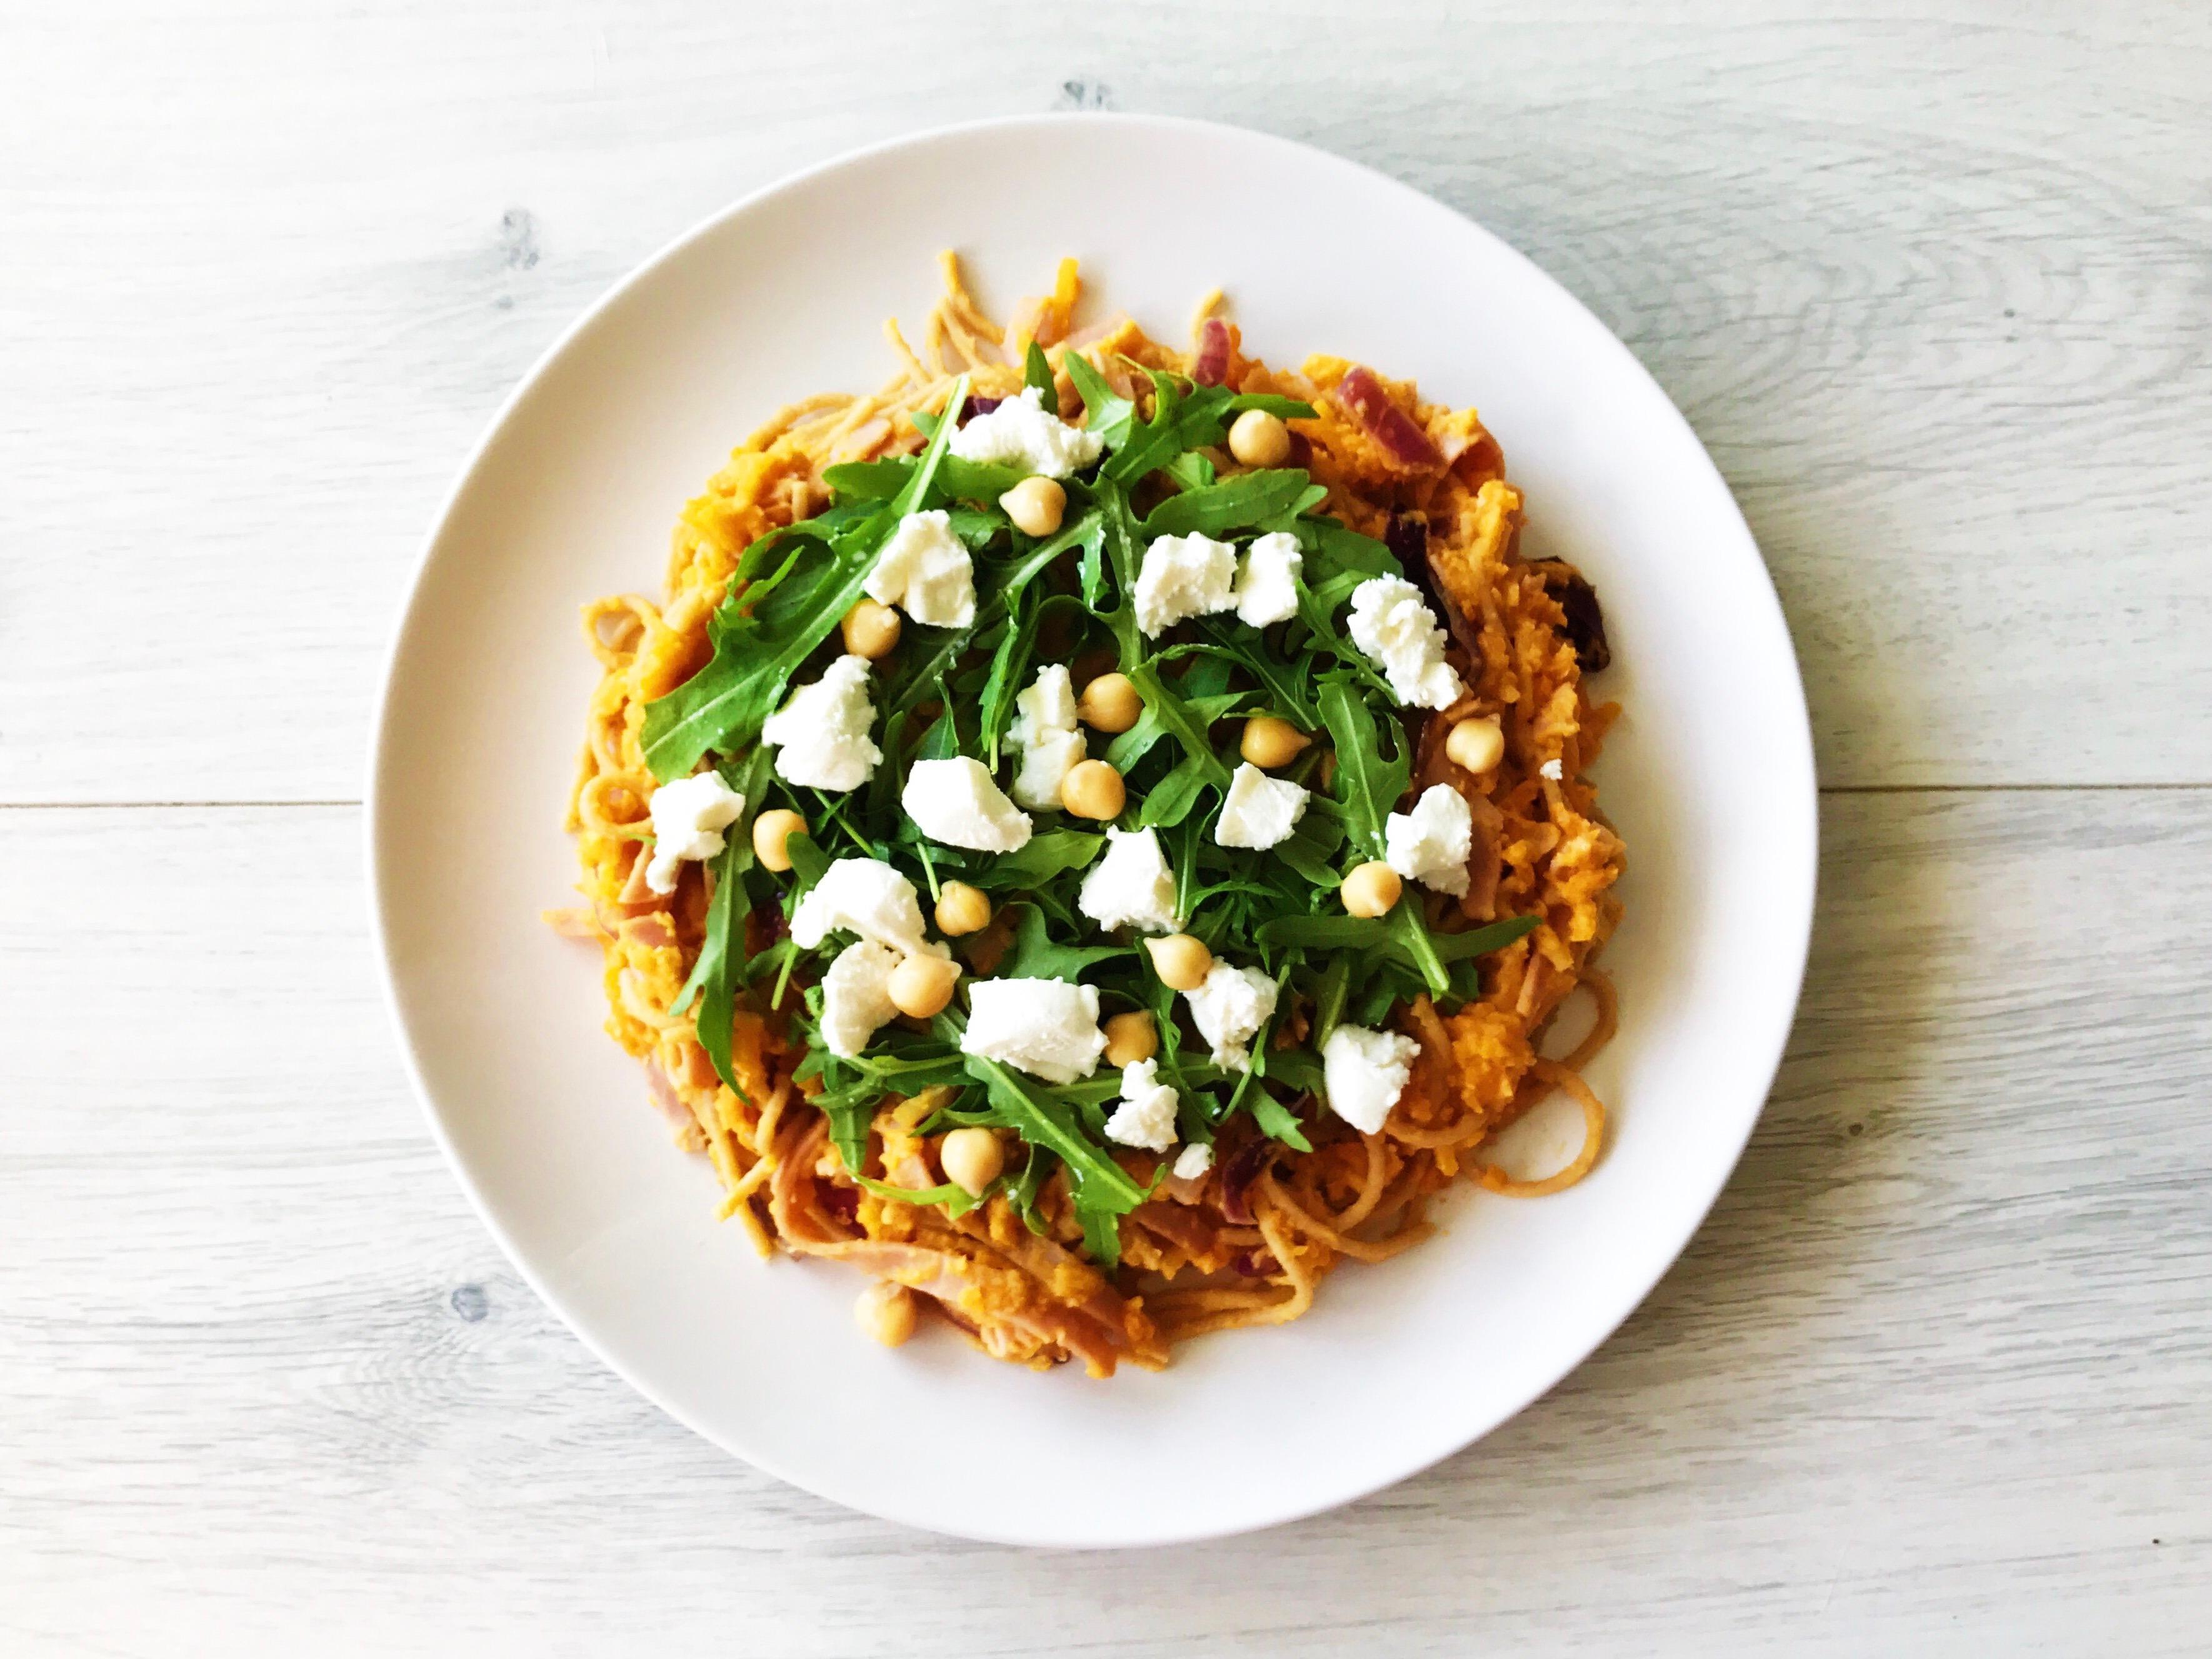 Pompoen Spaghetti met Ham en Geitenkaas gezond recept afvallen almere